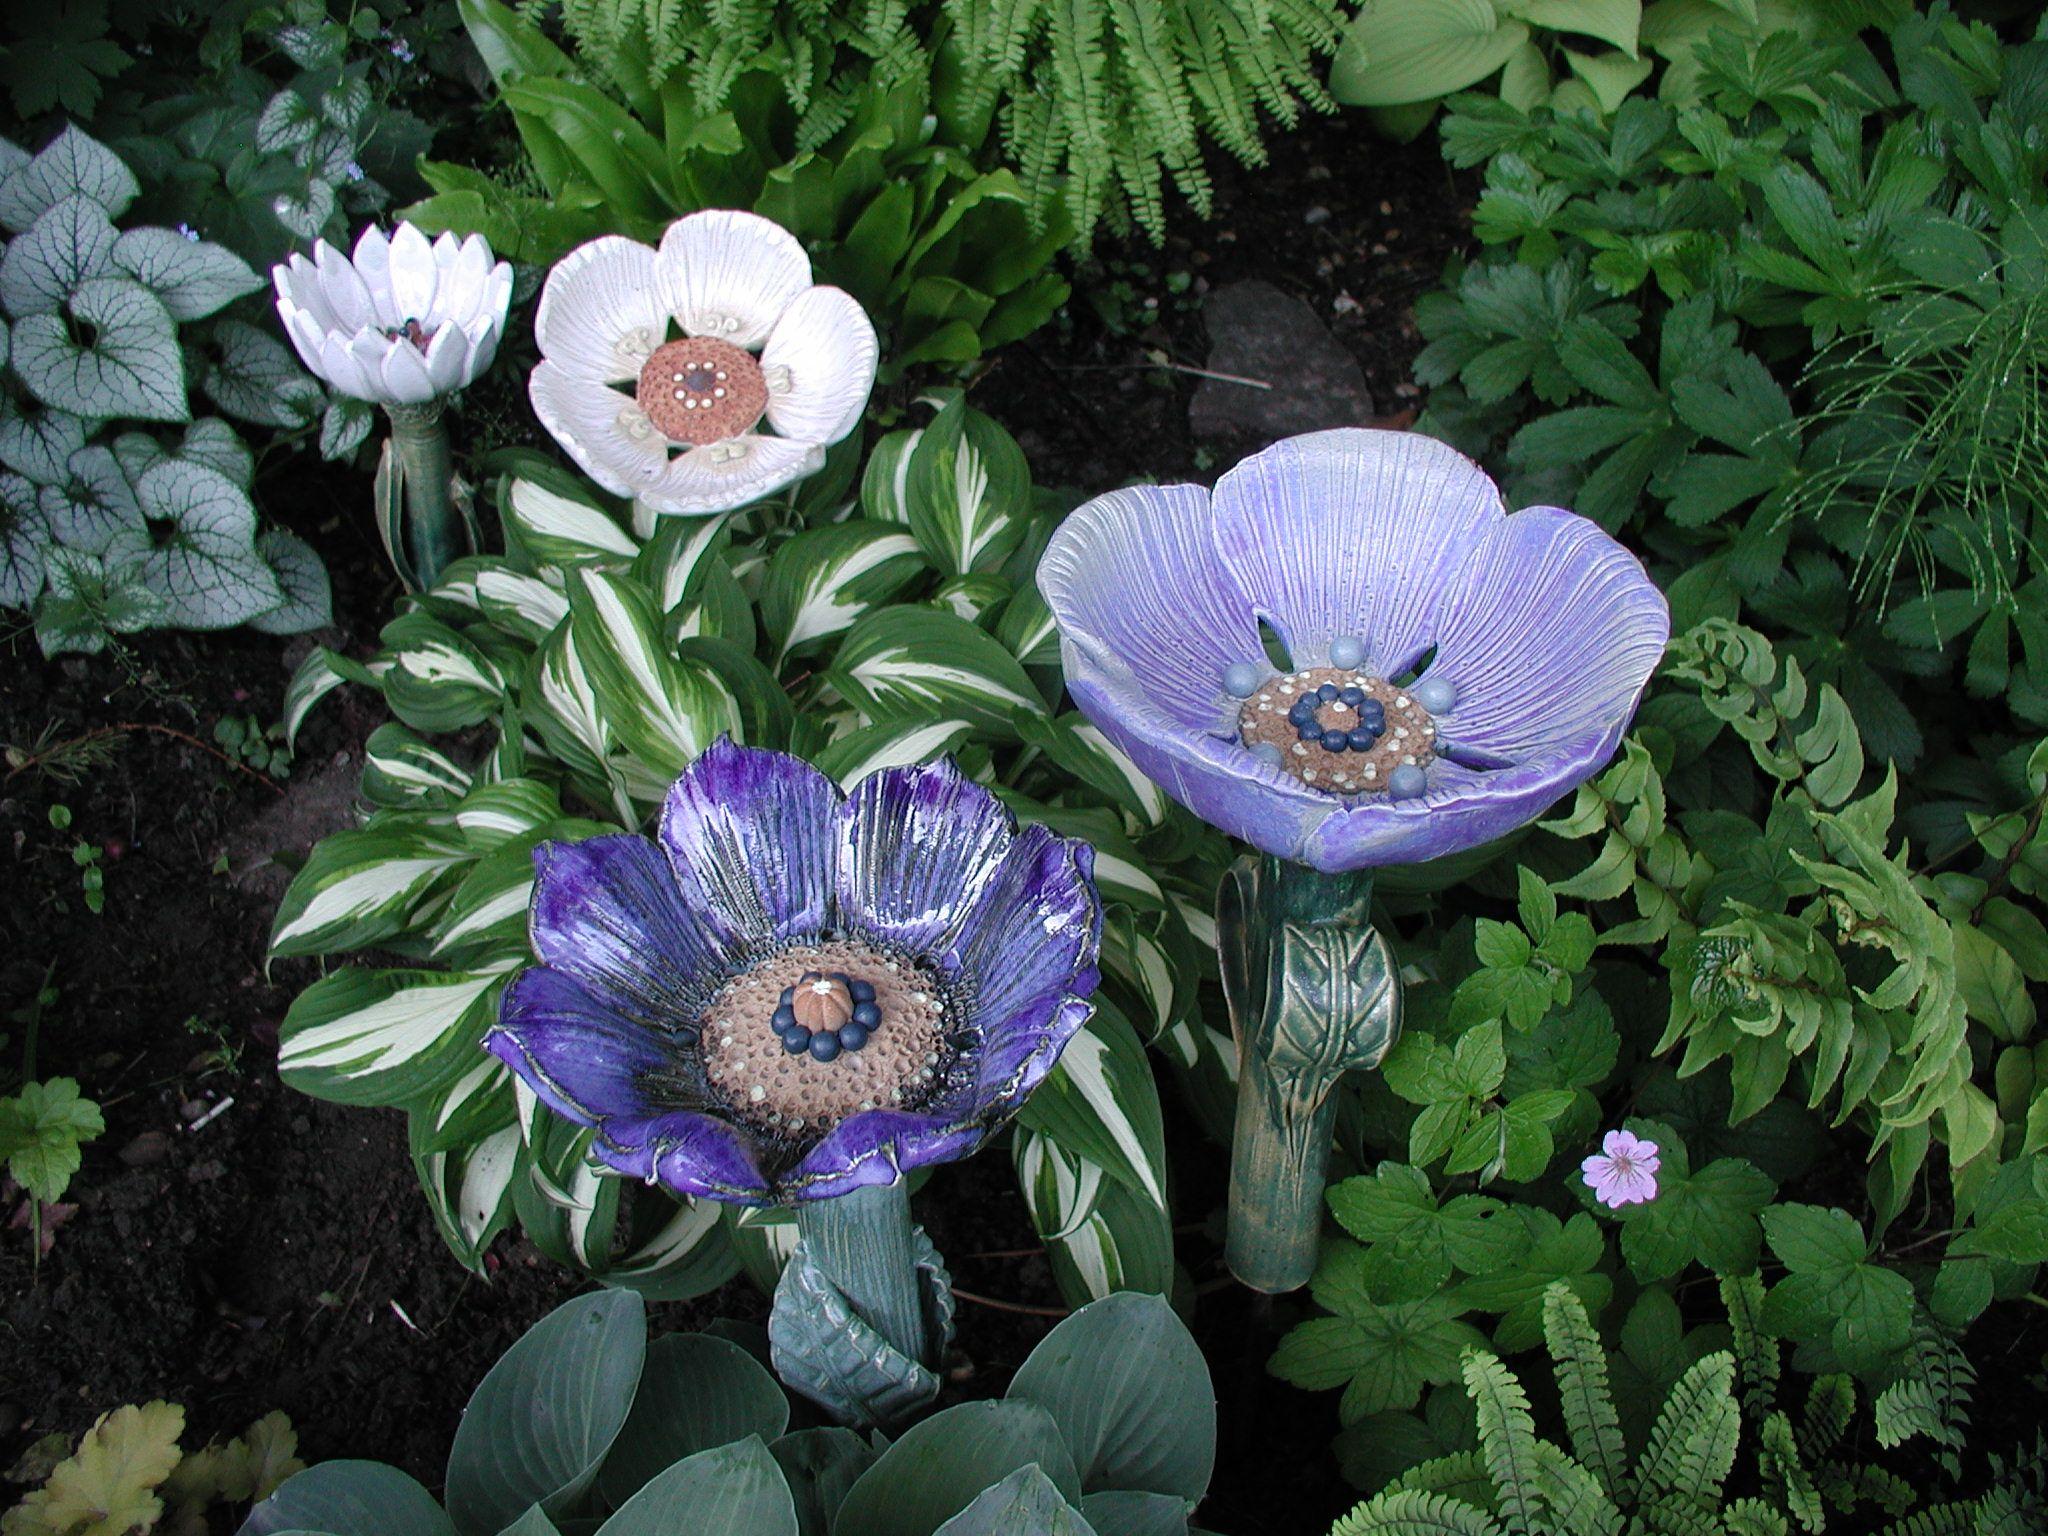 keramikblumen im schattenbeet como la flor pinterest. Black Bedroom Furniture Sets. Home Design Ideas